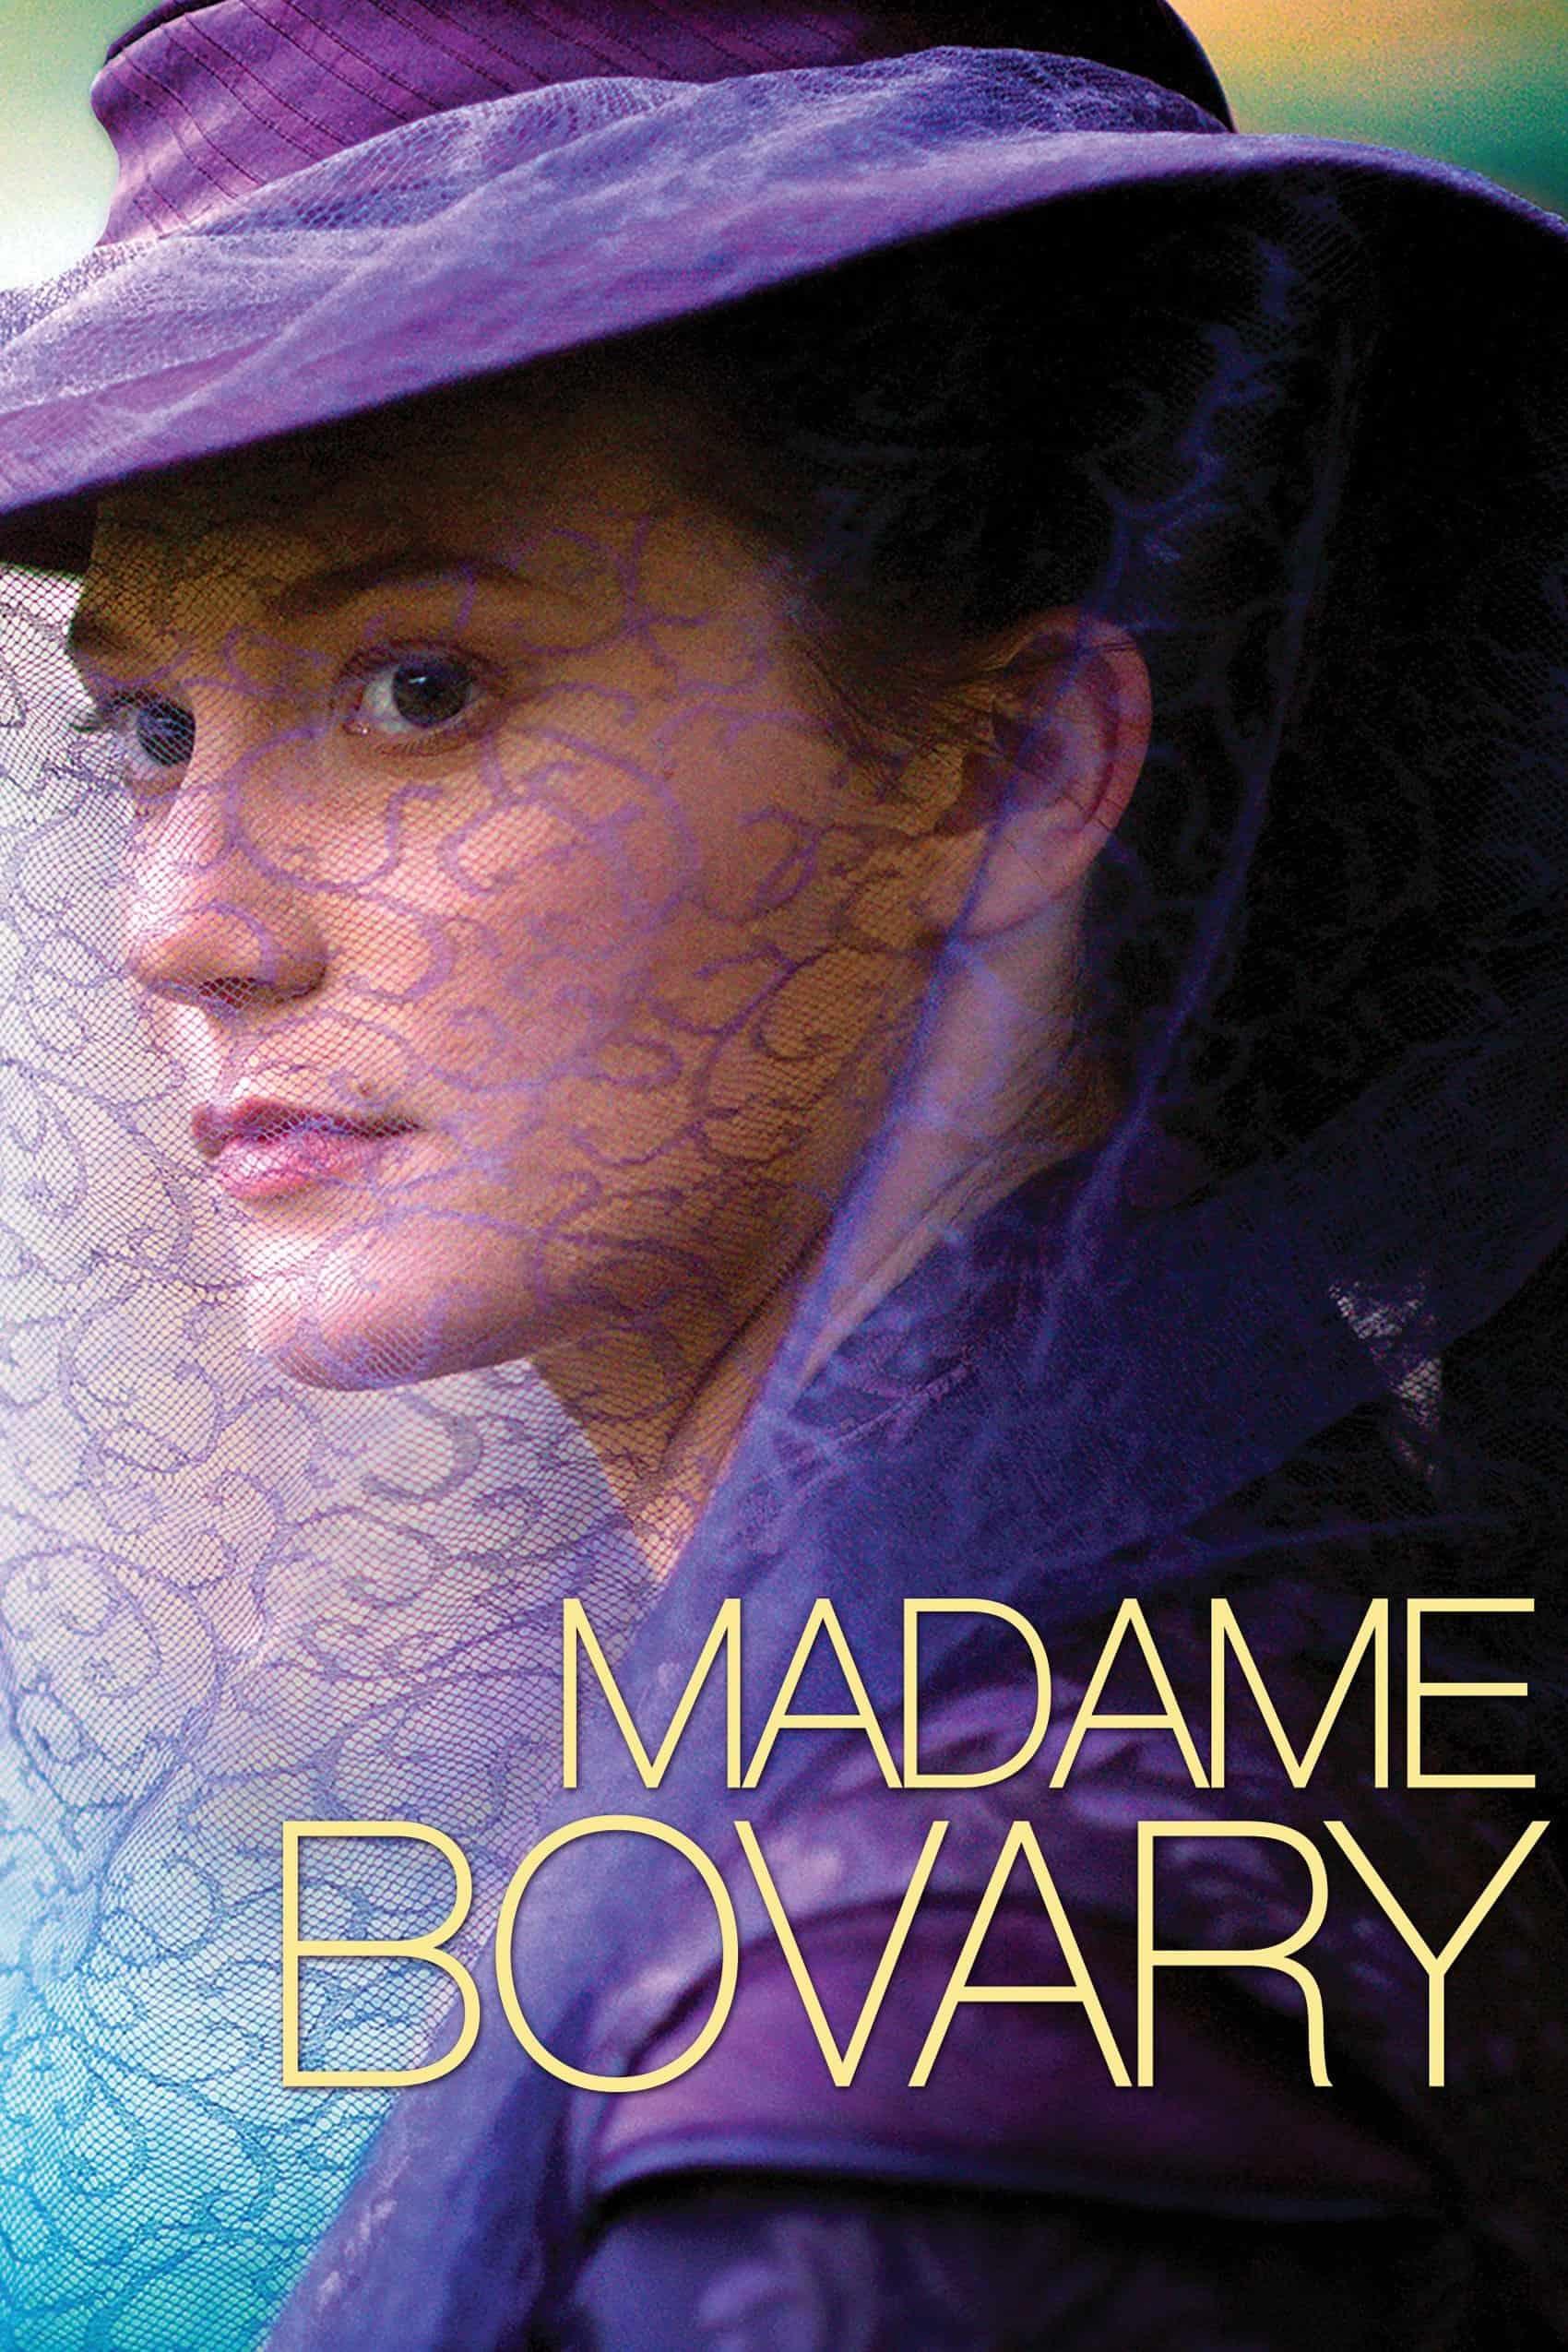 Madame Bovary, 2014